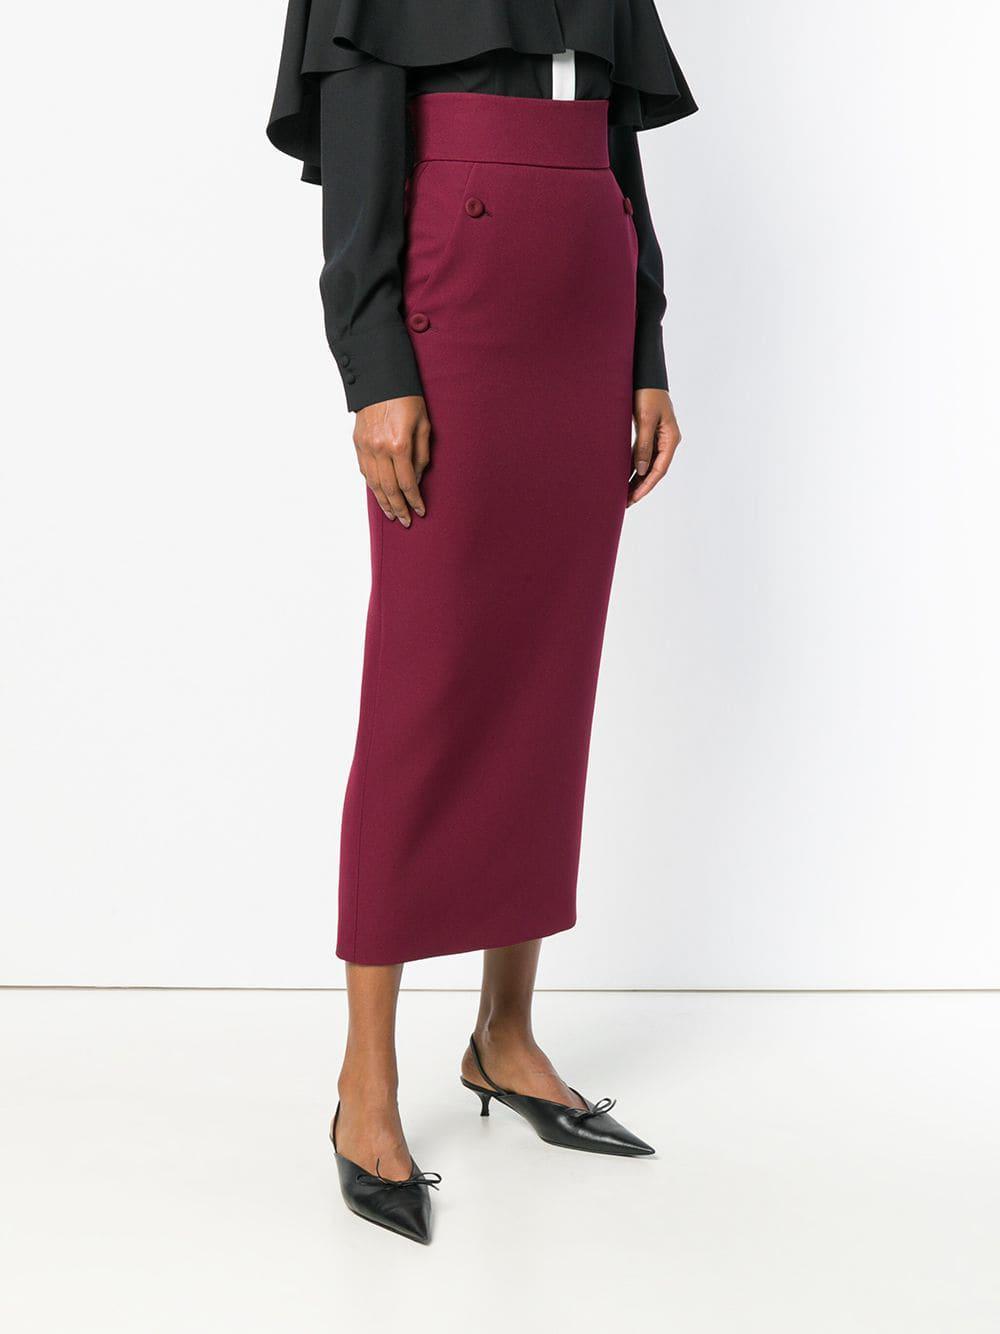 05cb9e5e98df Sara Battaglia - Red High Waisted Pencil Skirt - Lyst. View fullscreen